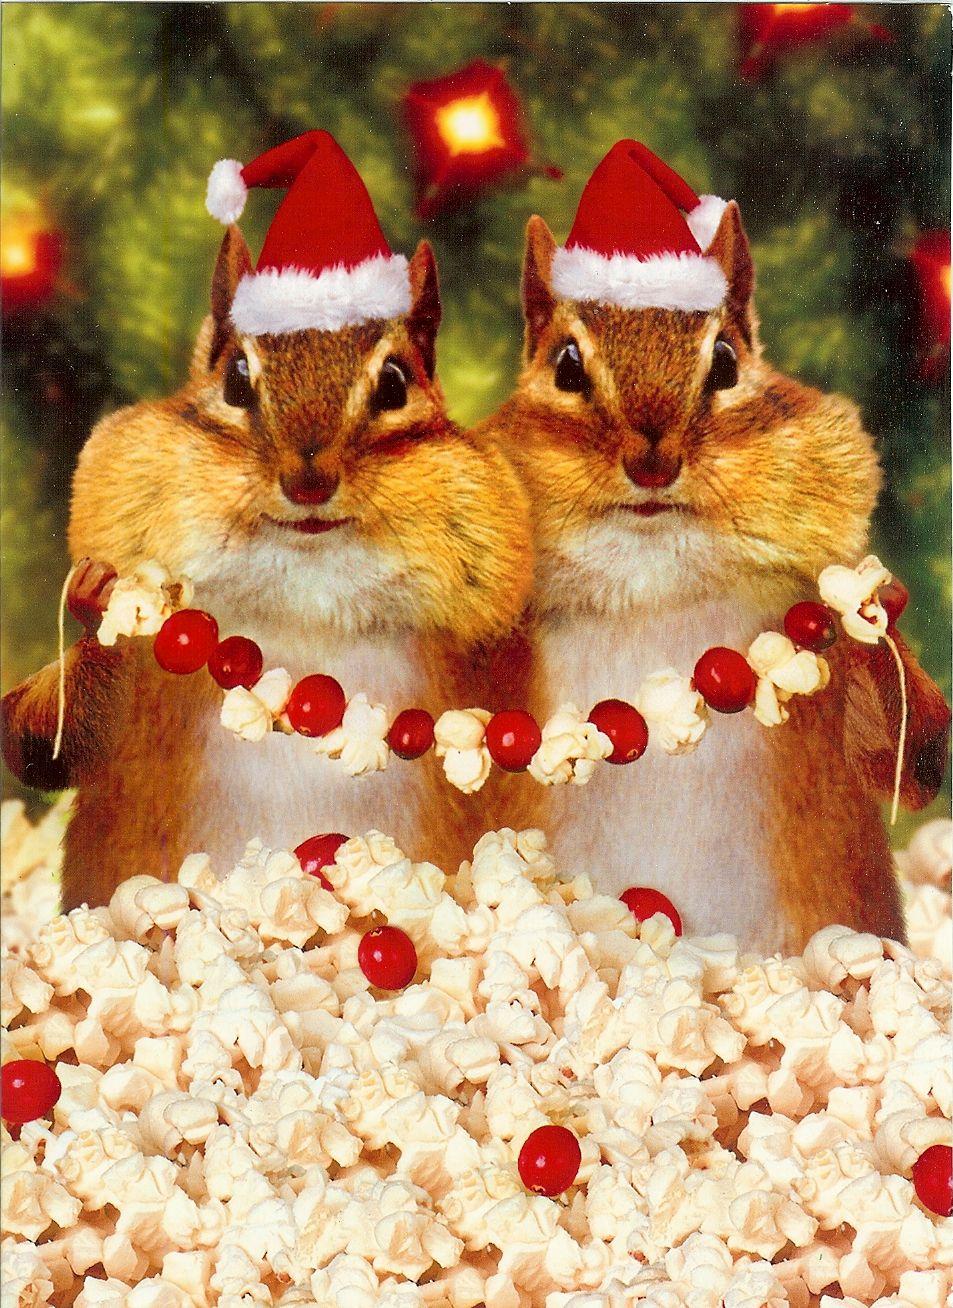 #funny, #chipmunk, #Christmas, #Holiday, #cute, #animal, #humor  Swag: http://www.cafepress.com/tlconline